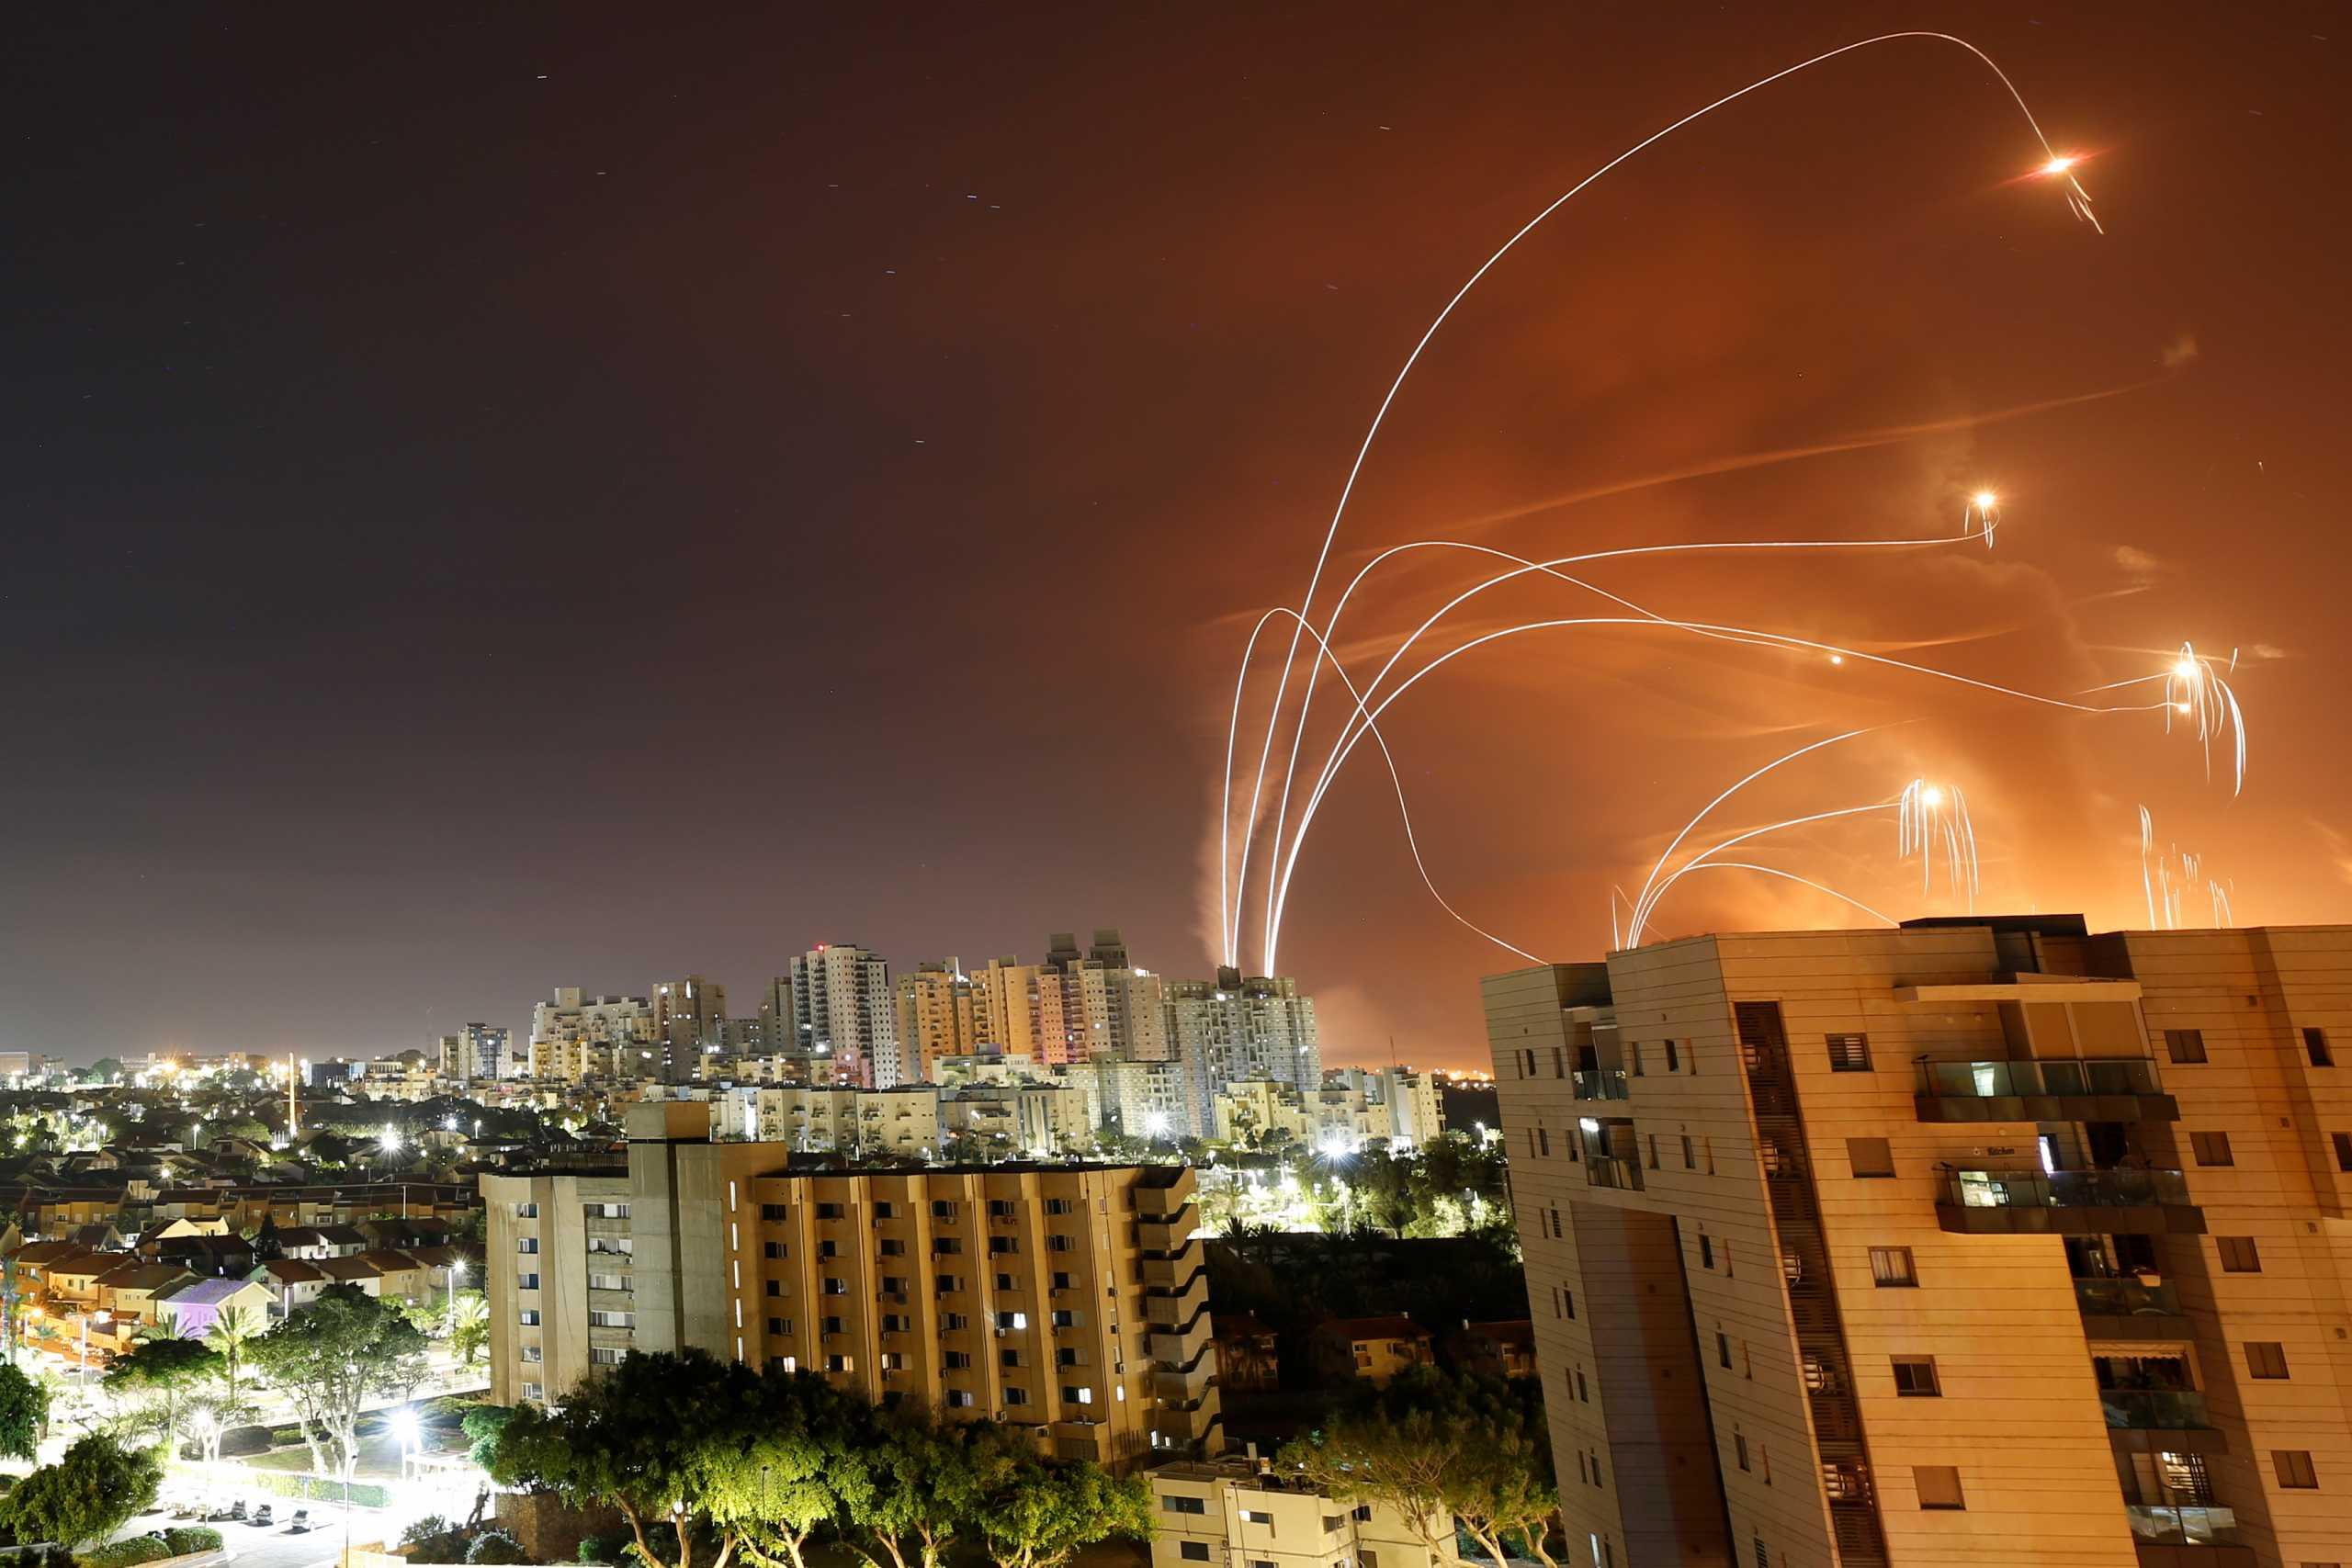 Tageszeitung: Η Χαμάς δεν πληγώνει μόνο το Ισραήλ αλλά και τους Παλαιστινίους